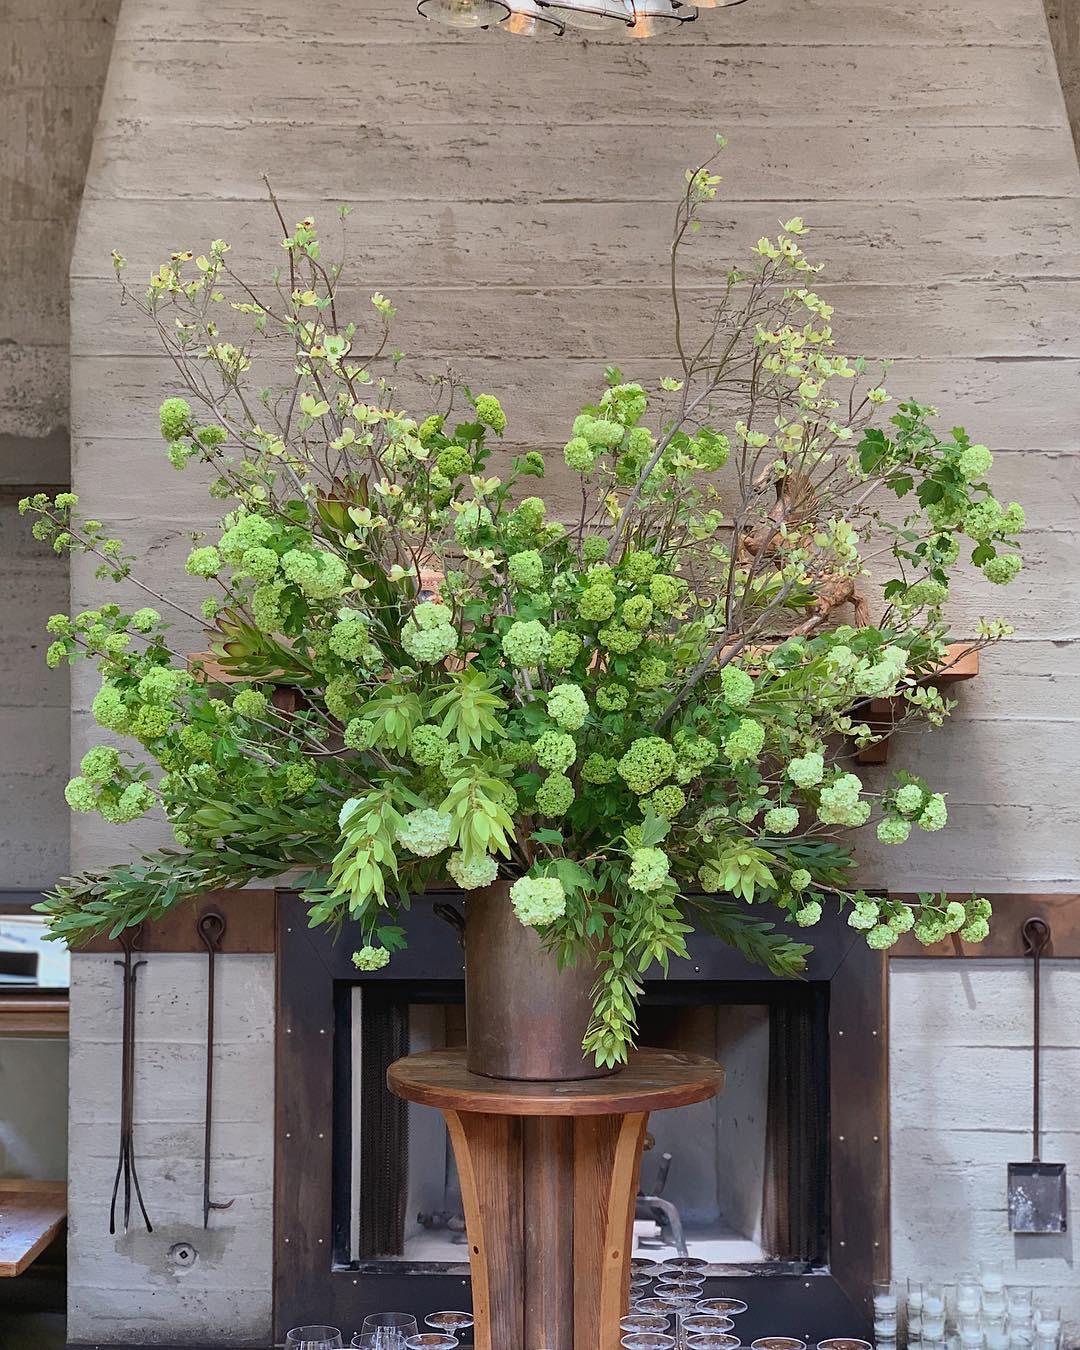 Floral Arrangements by Wallflower Design seen at Foreign Cinema, San Francisco - Floral Design